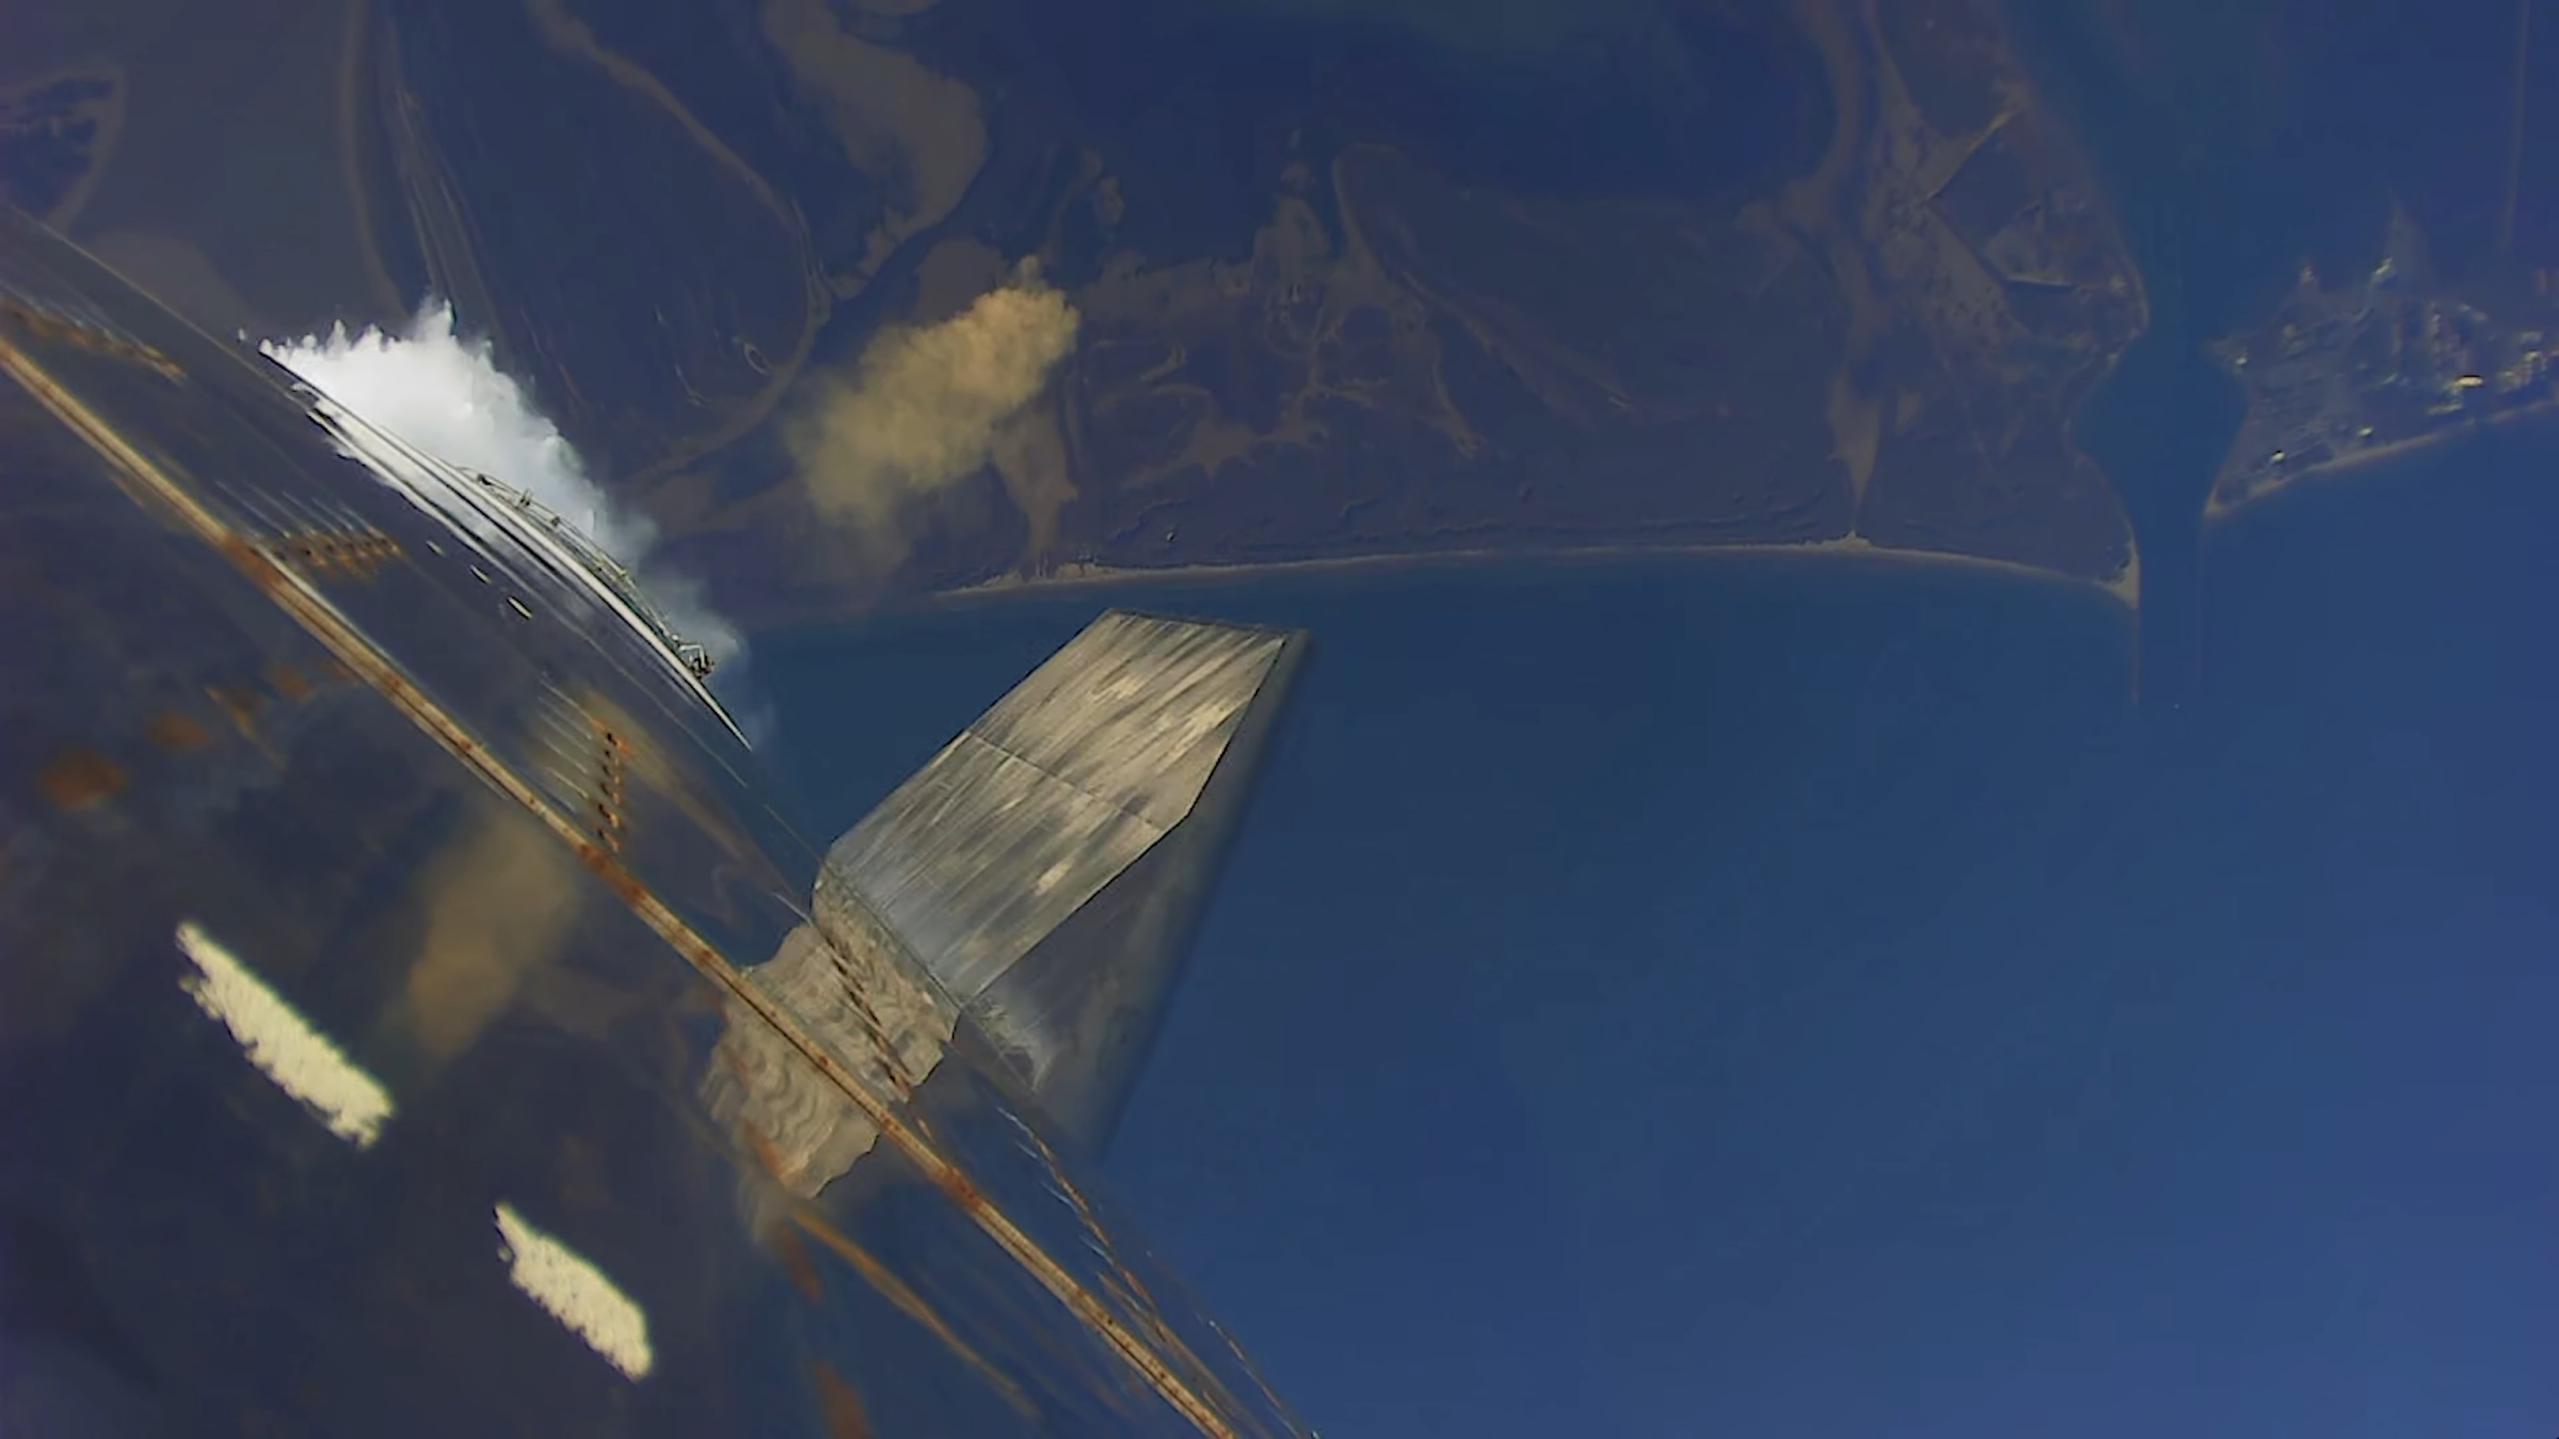 Starship SN8 launch recap 120920 (SpaceX) descent 1 (c)